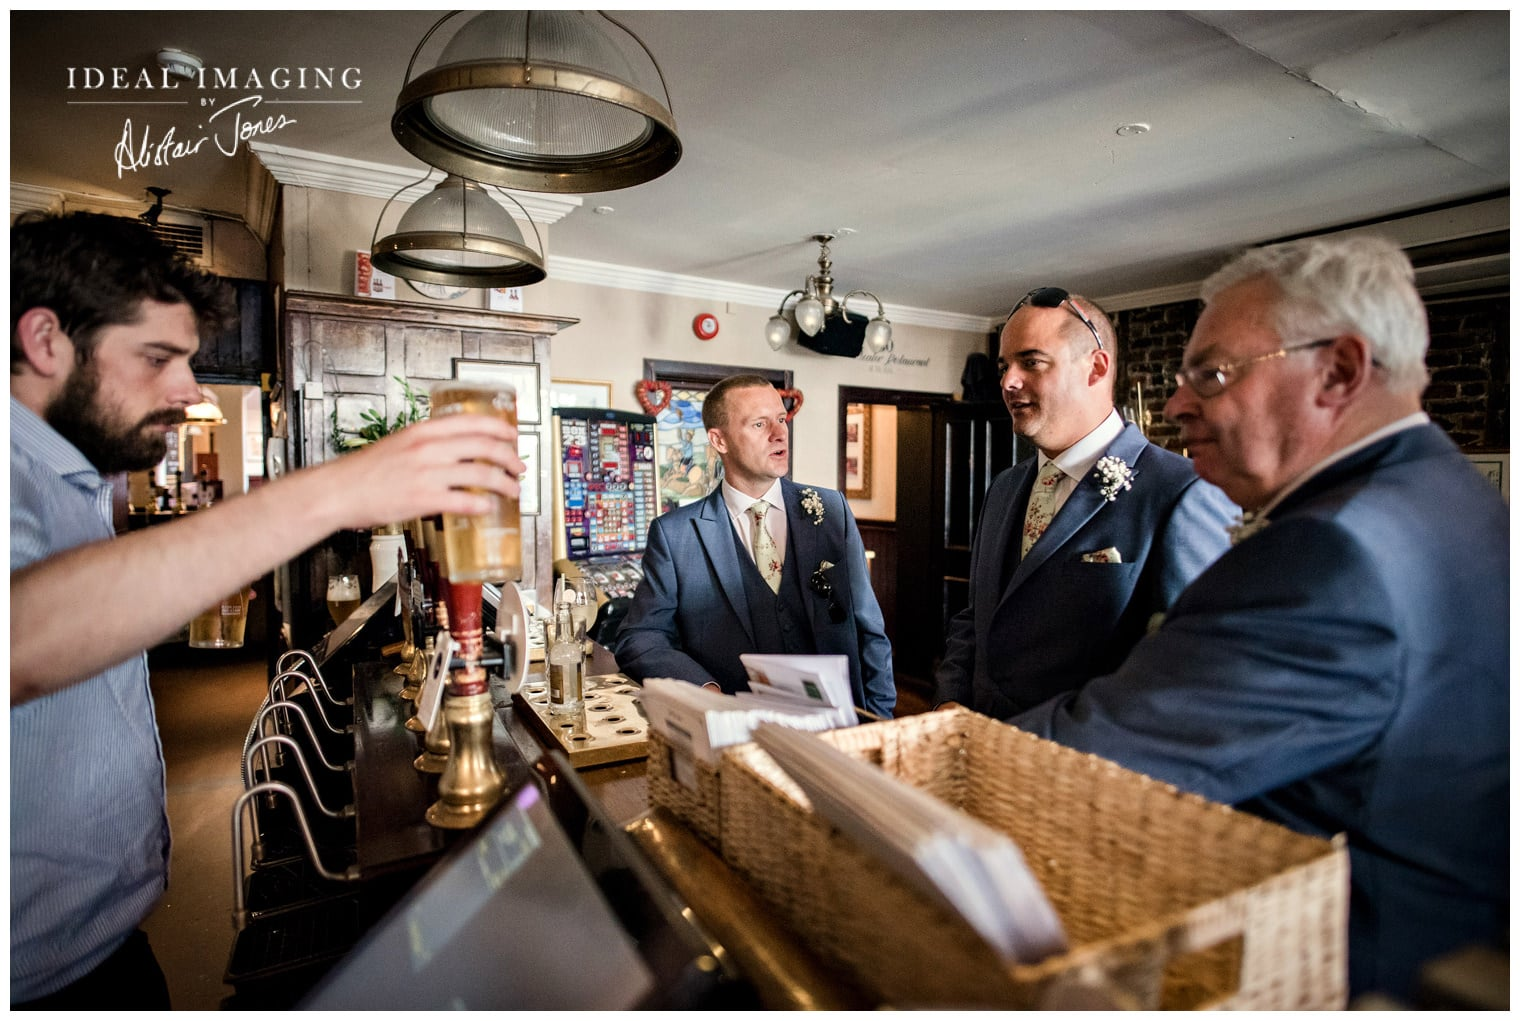 canterbury_cathedral_wedding-007